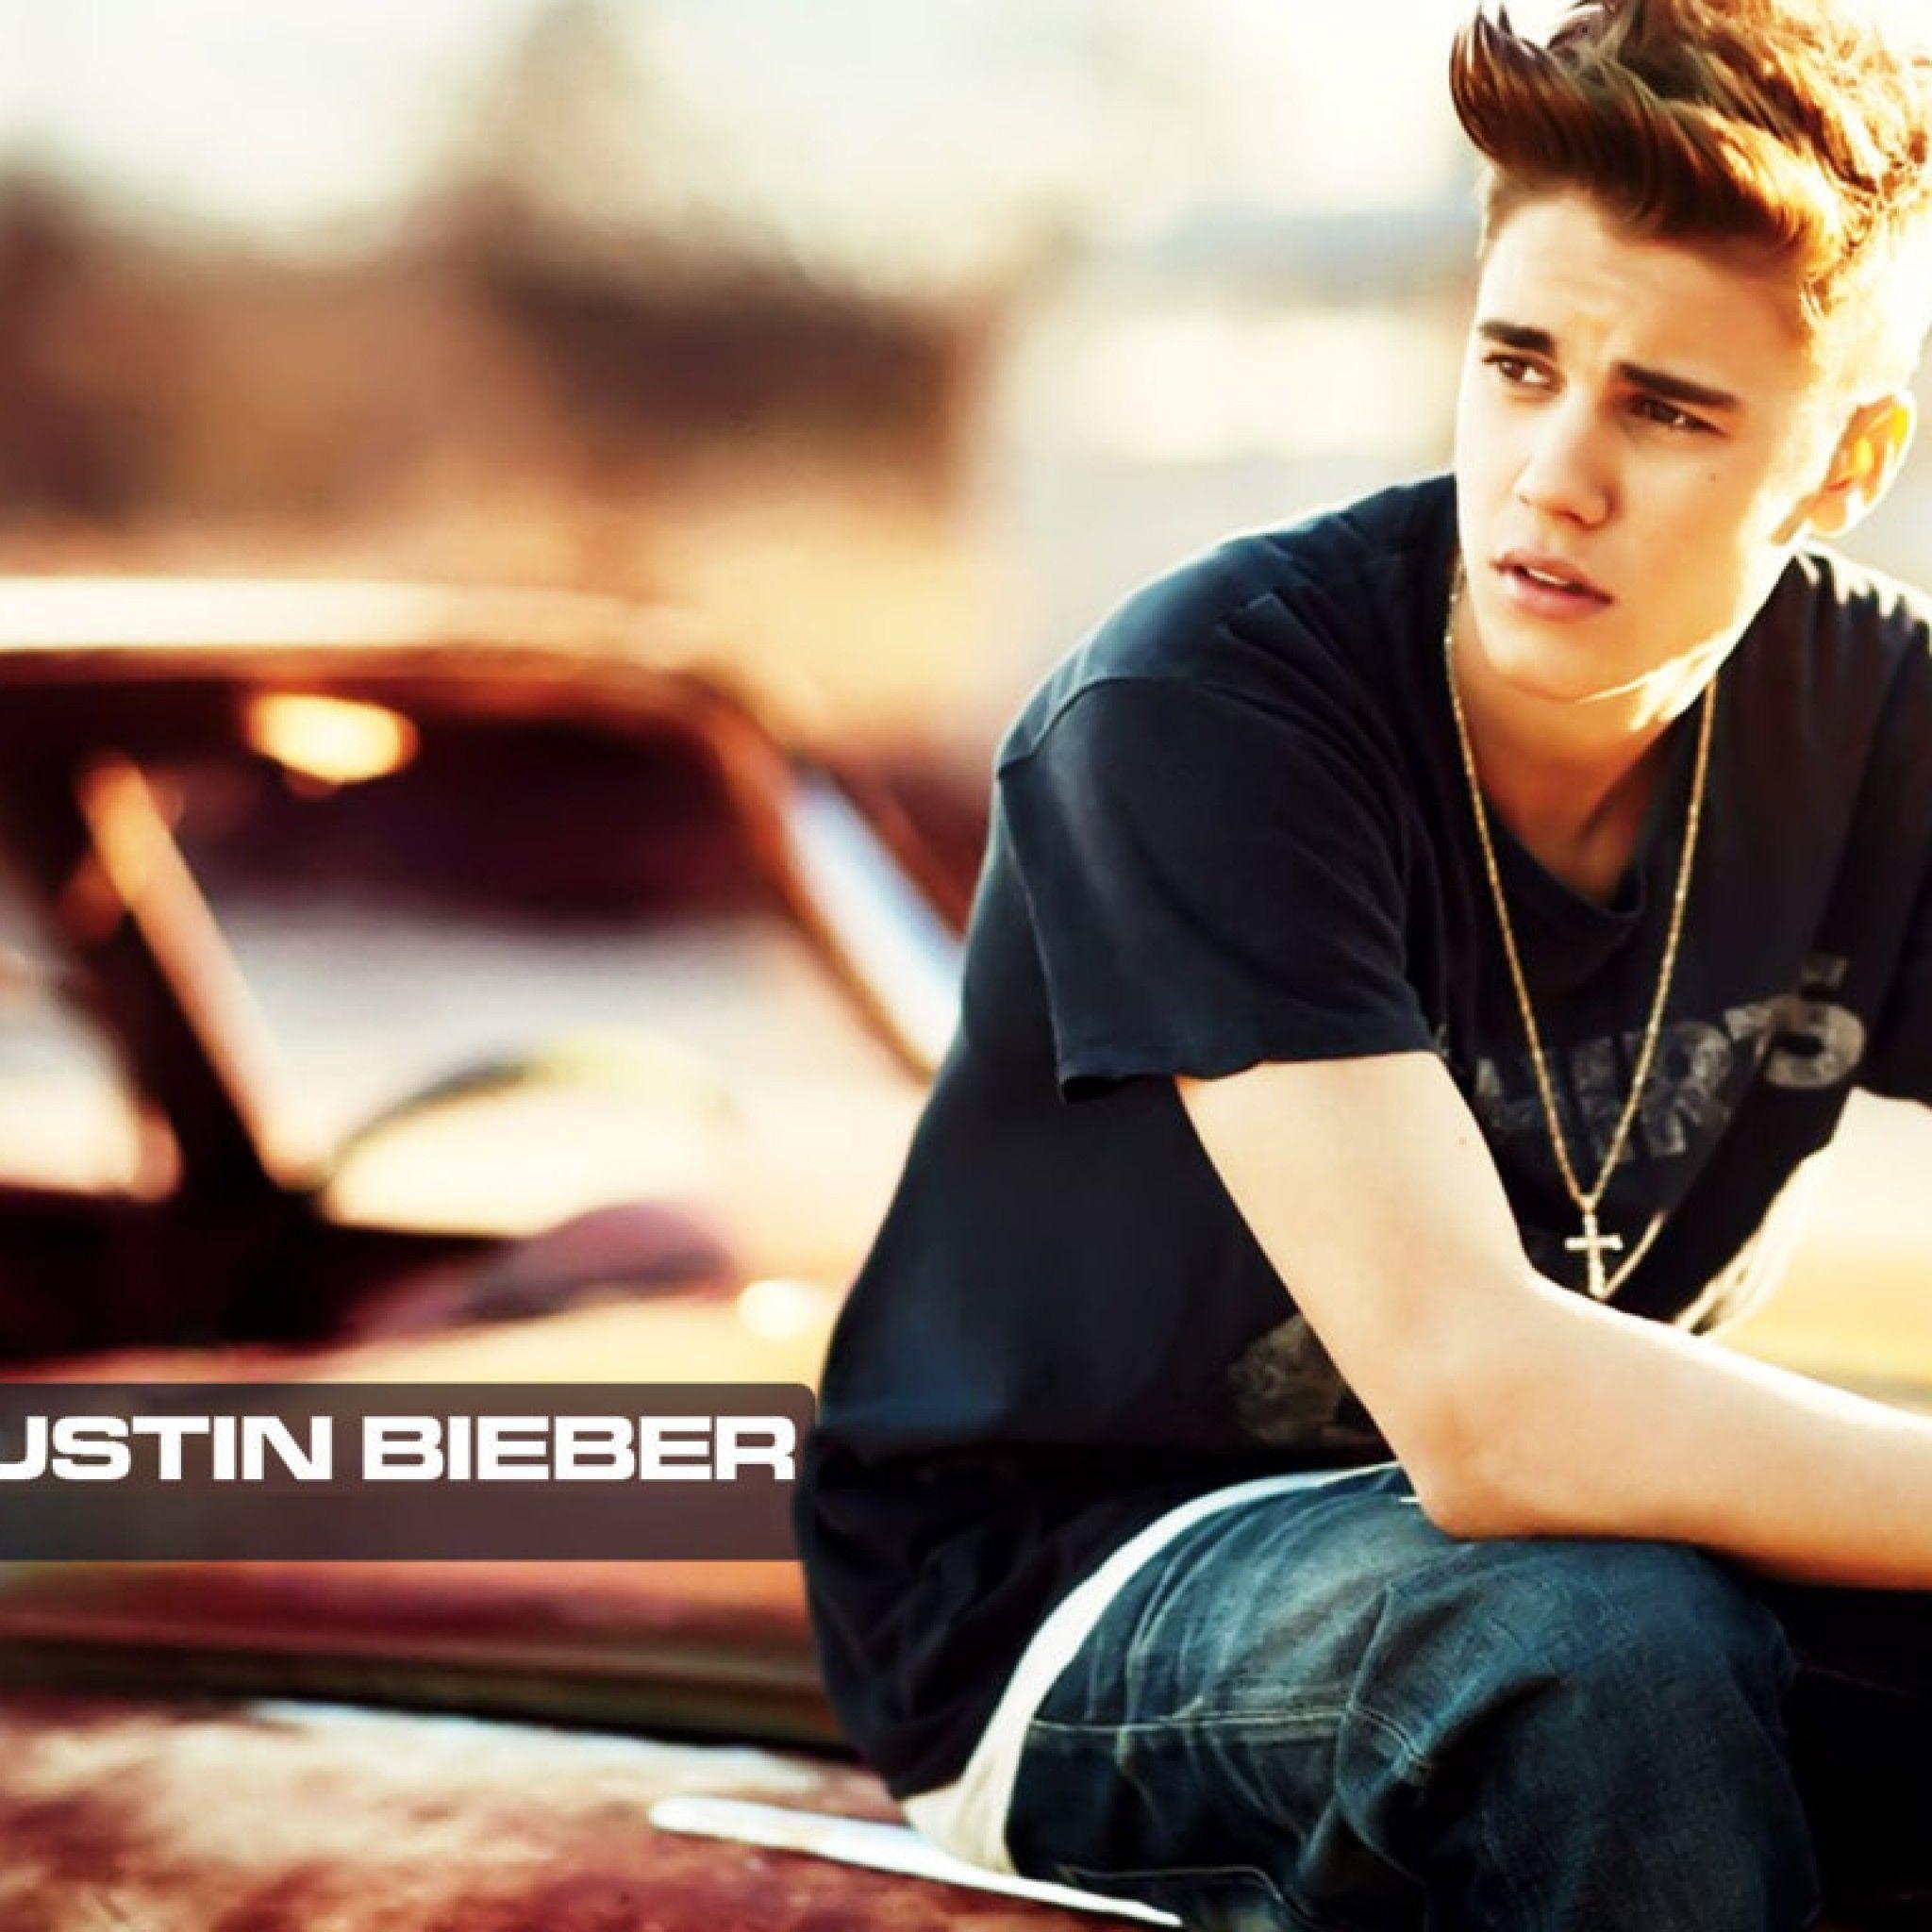 Hd wallpaper justin bieber - Justin Bieber Wallpapers Hd 2015 Wallpaper Cave